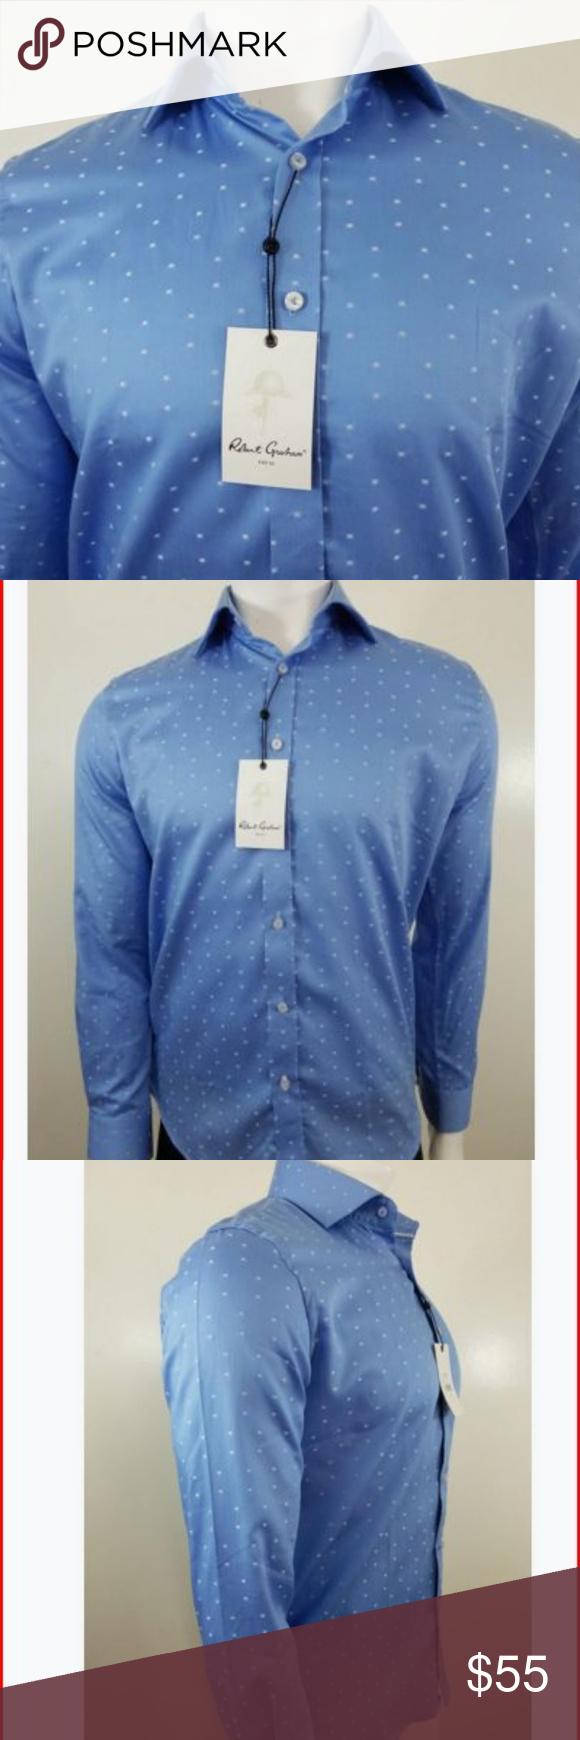 Robert Graham Galway Dress Shirt Long Sleeve Med Nwt My Posh